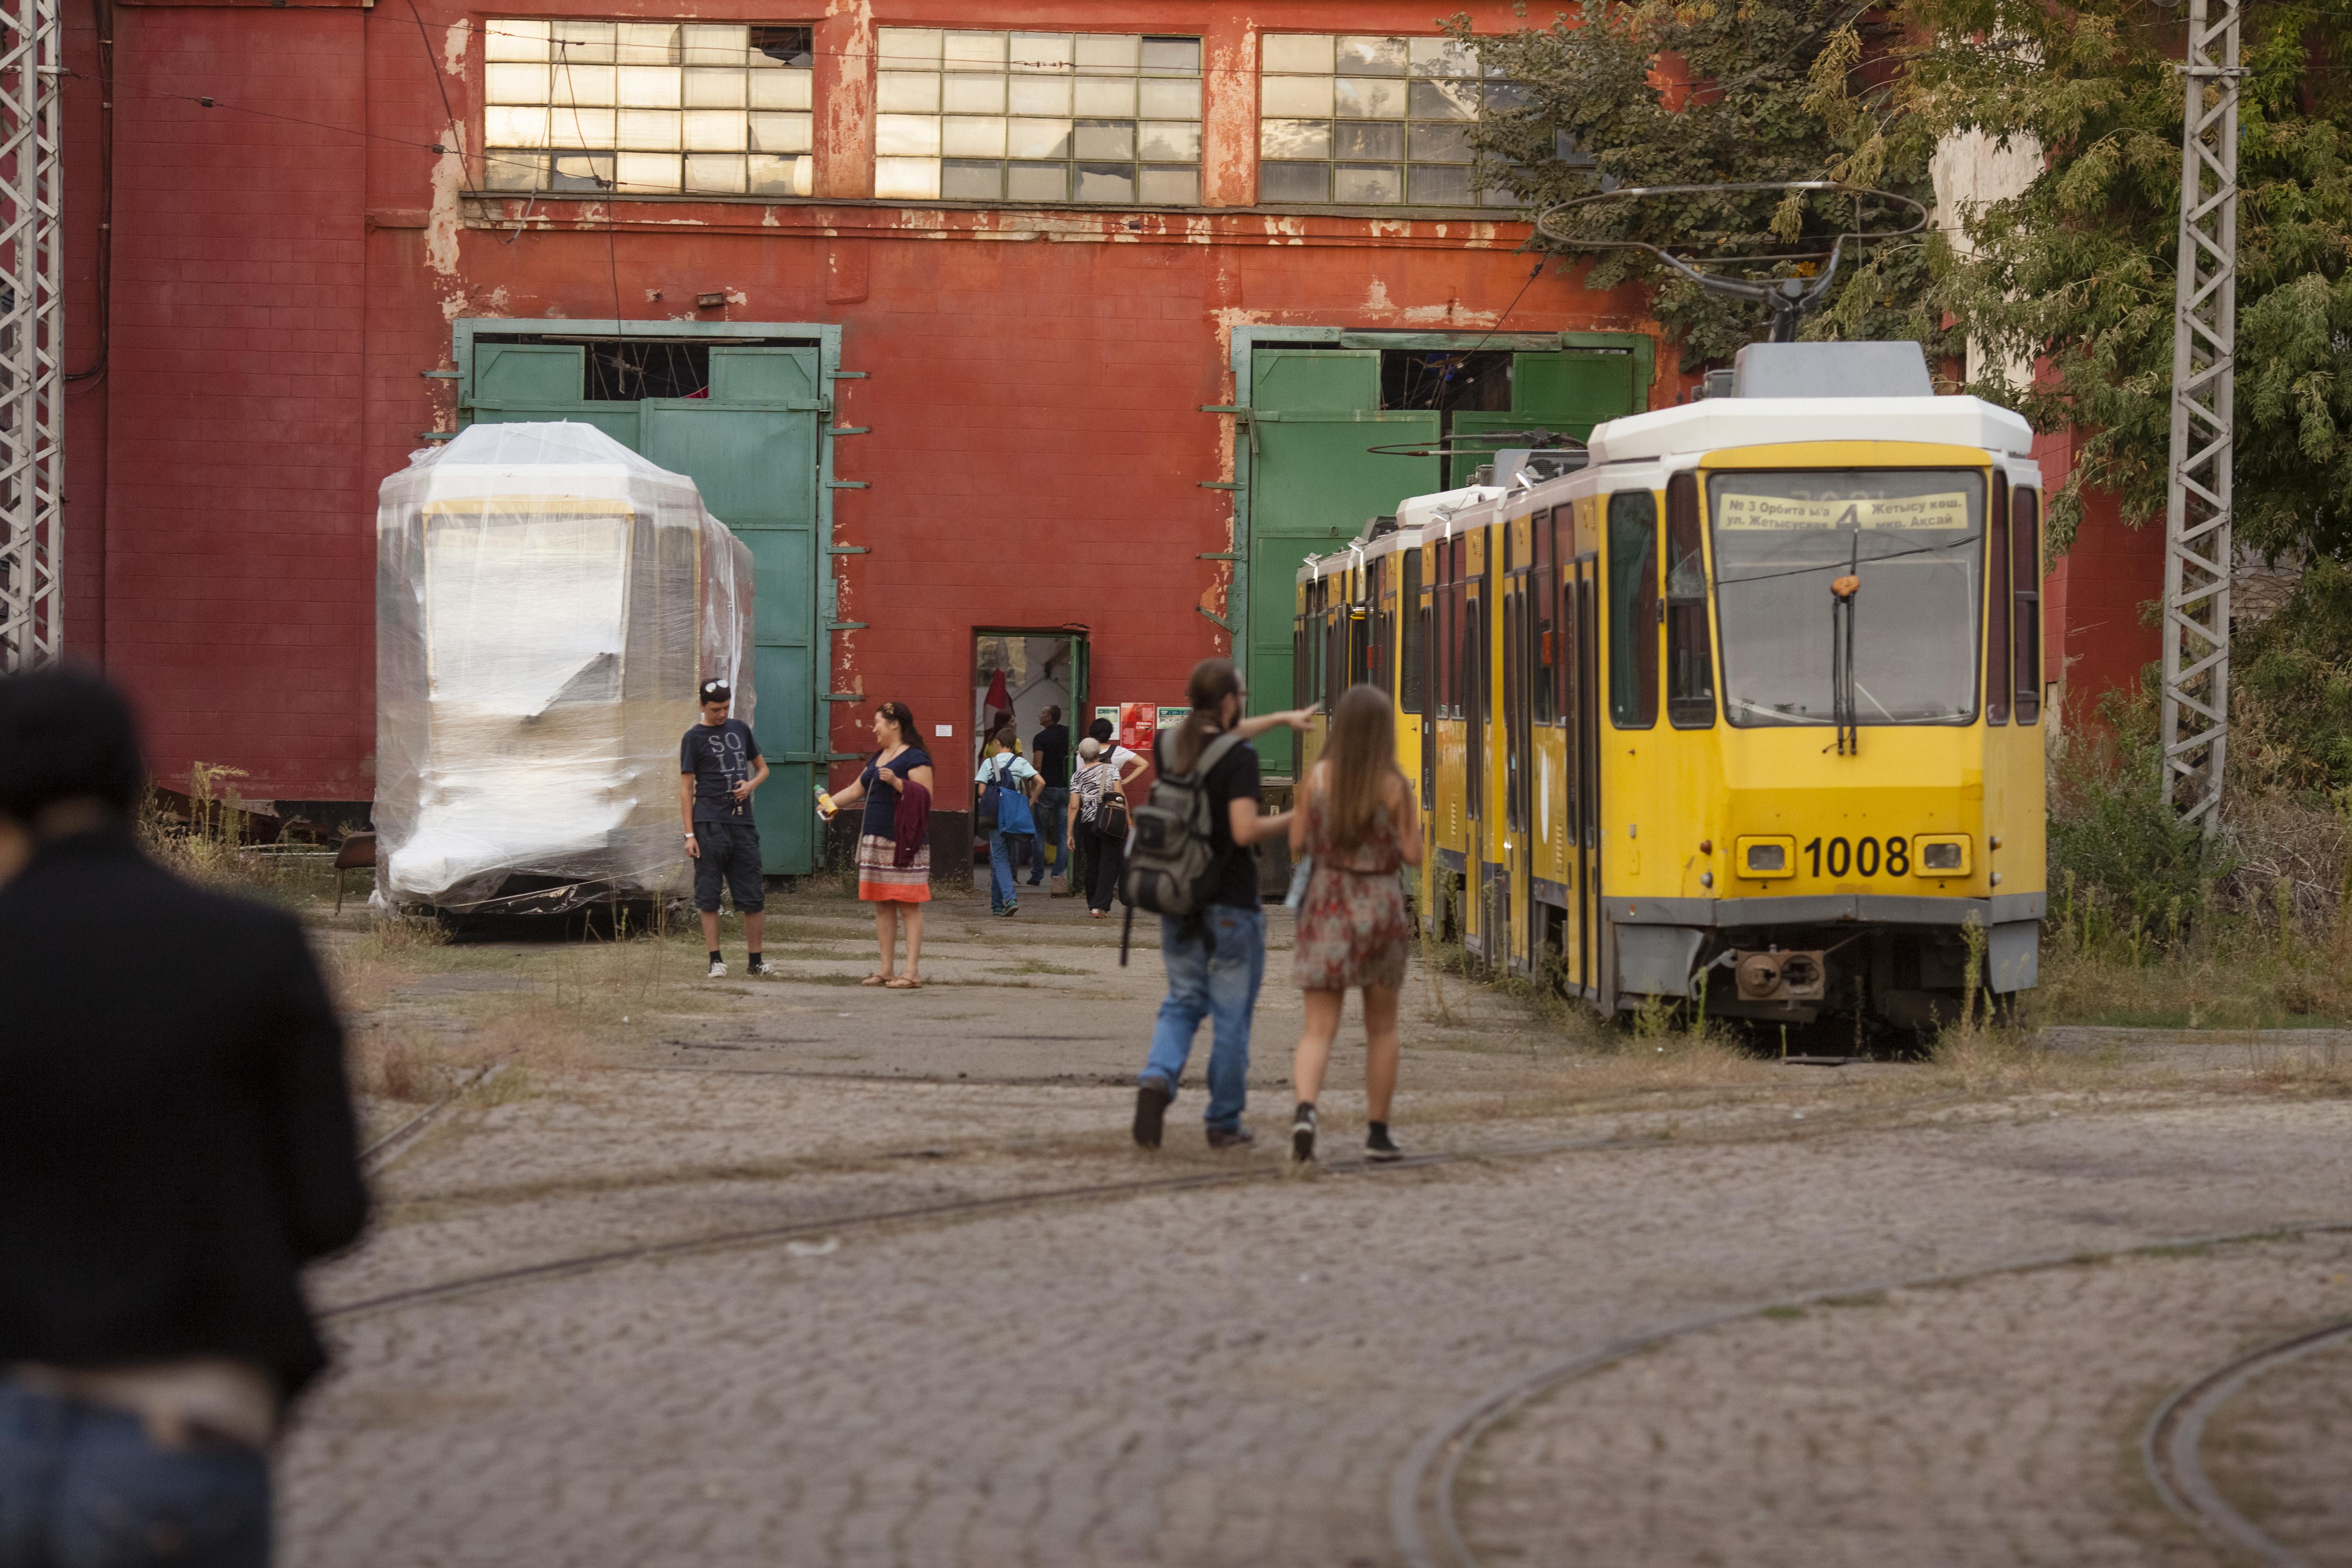 Tram_Depot_Exhibition (1)